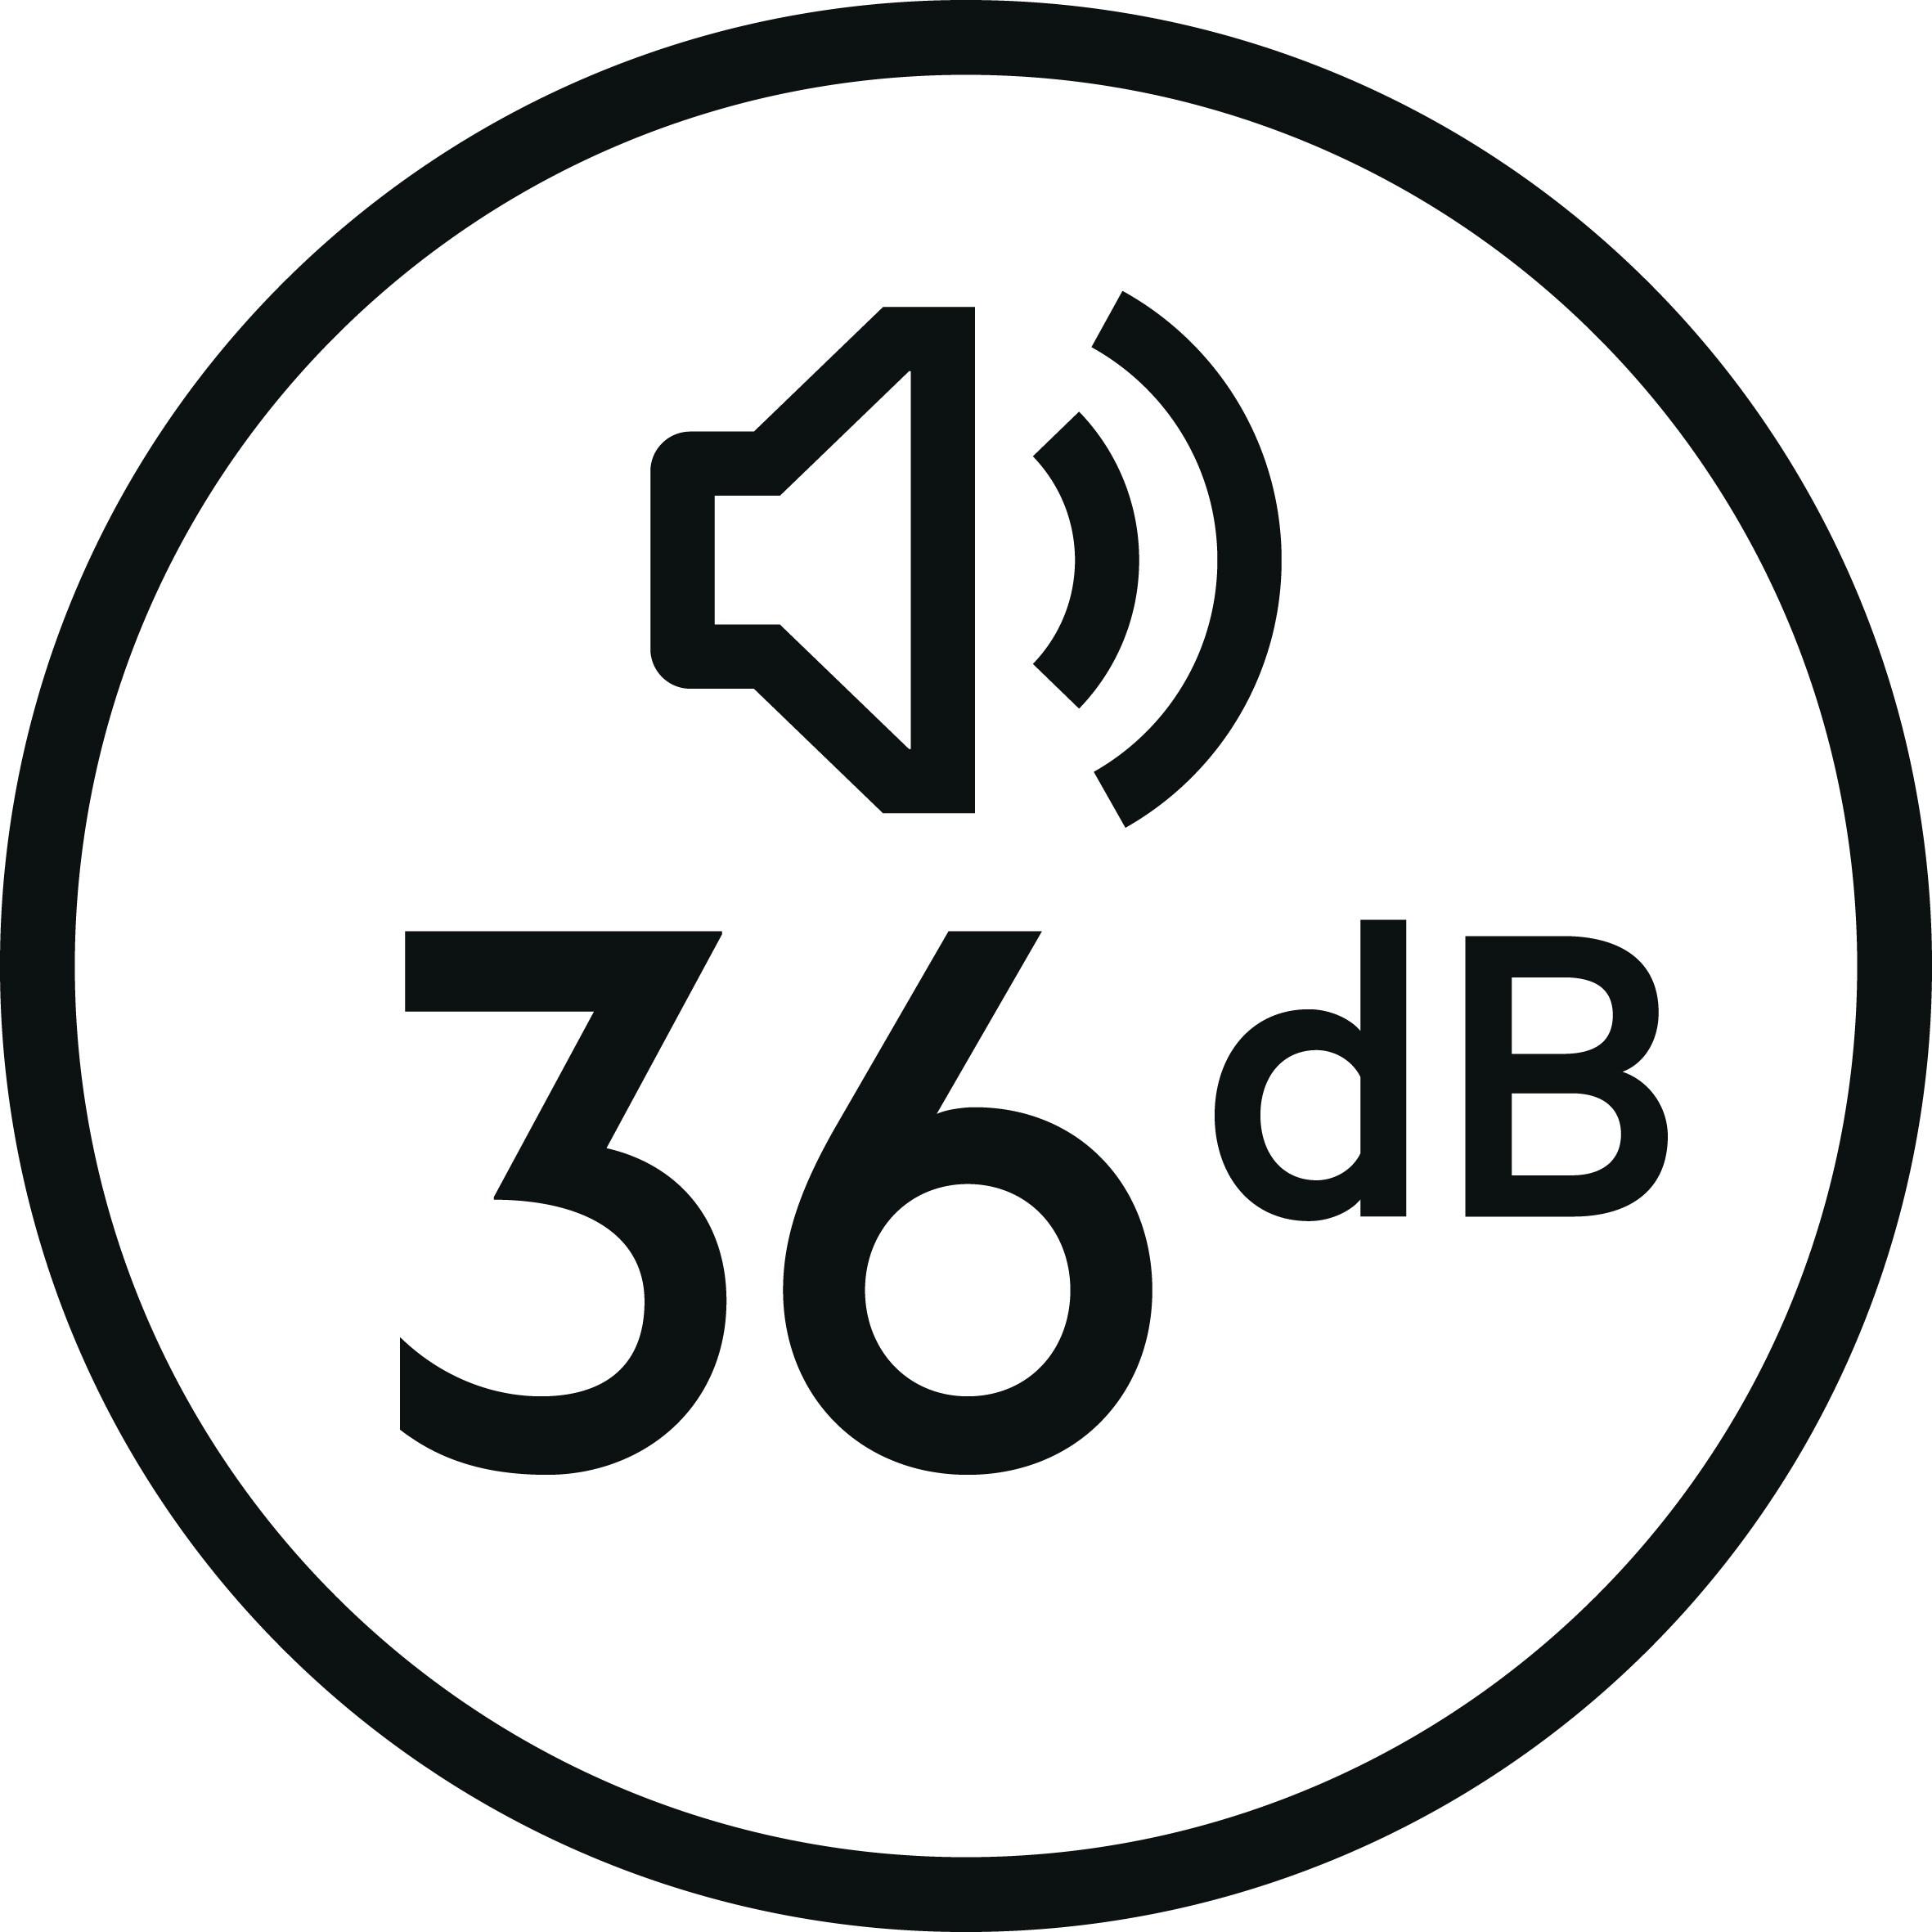 36dB-PSAAAP16PC569055 (1).jpg